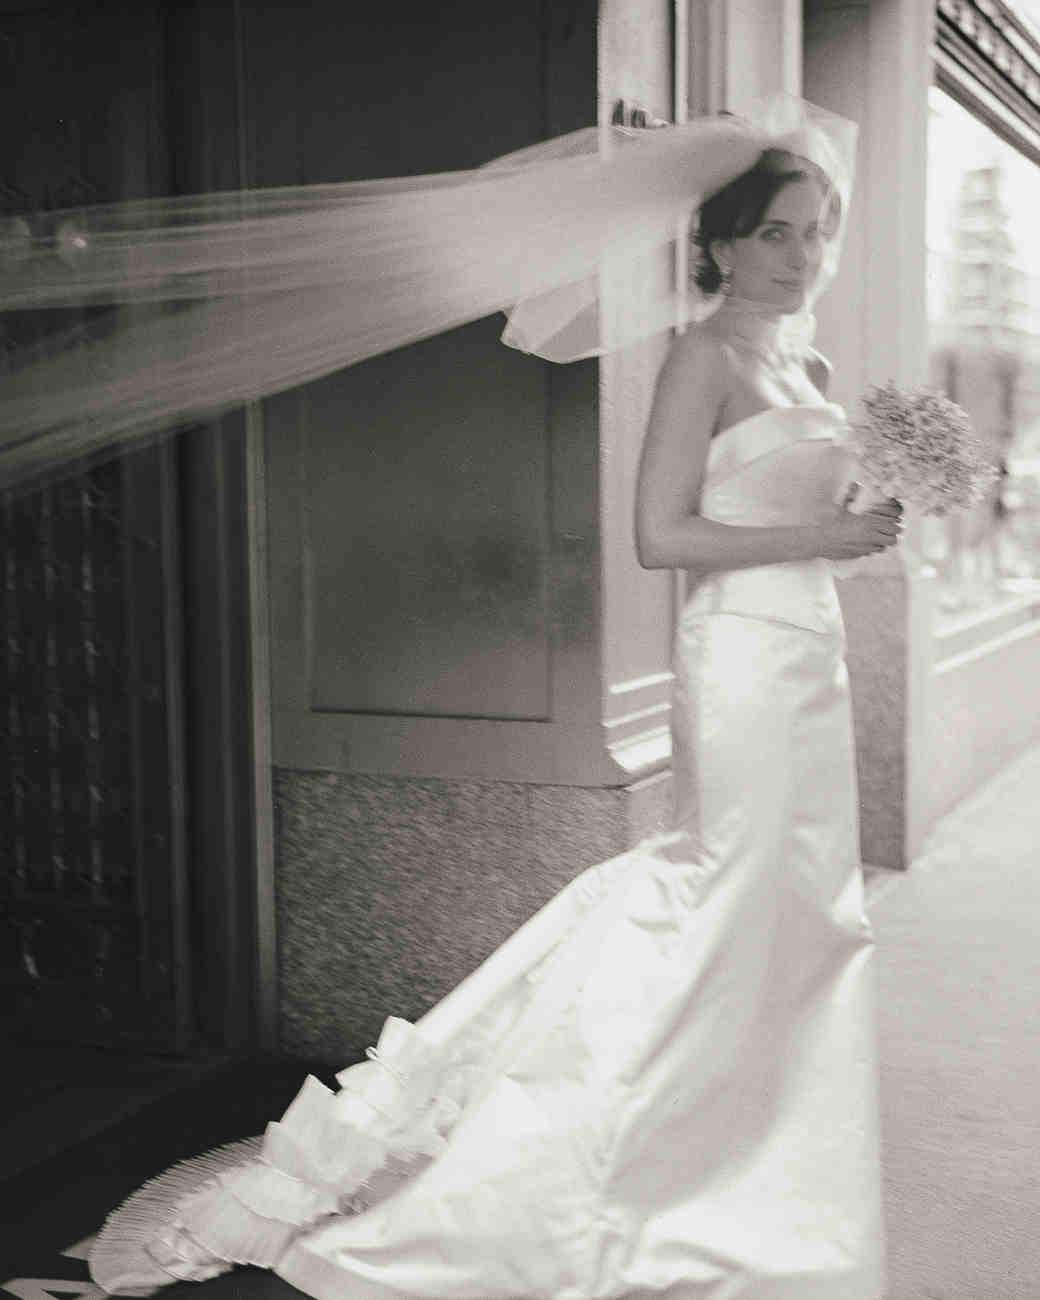 john-dolan-wedding-photographer-fall-2001-2-0914.jpg